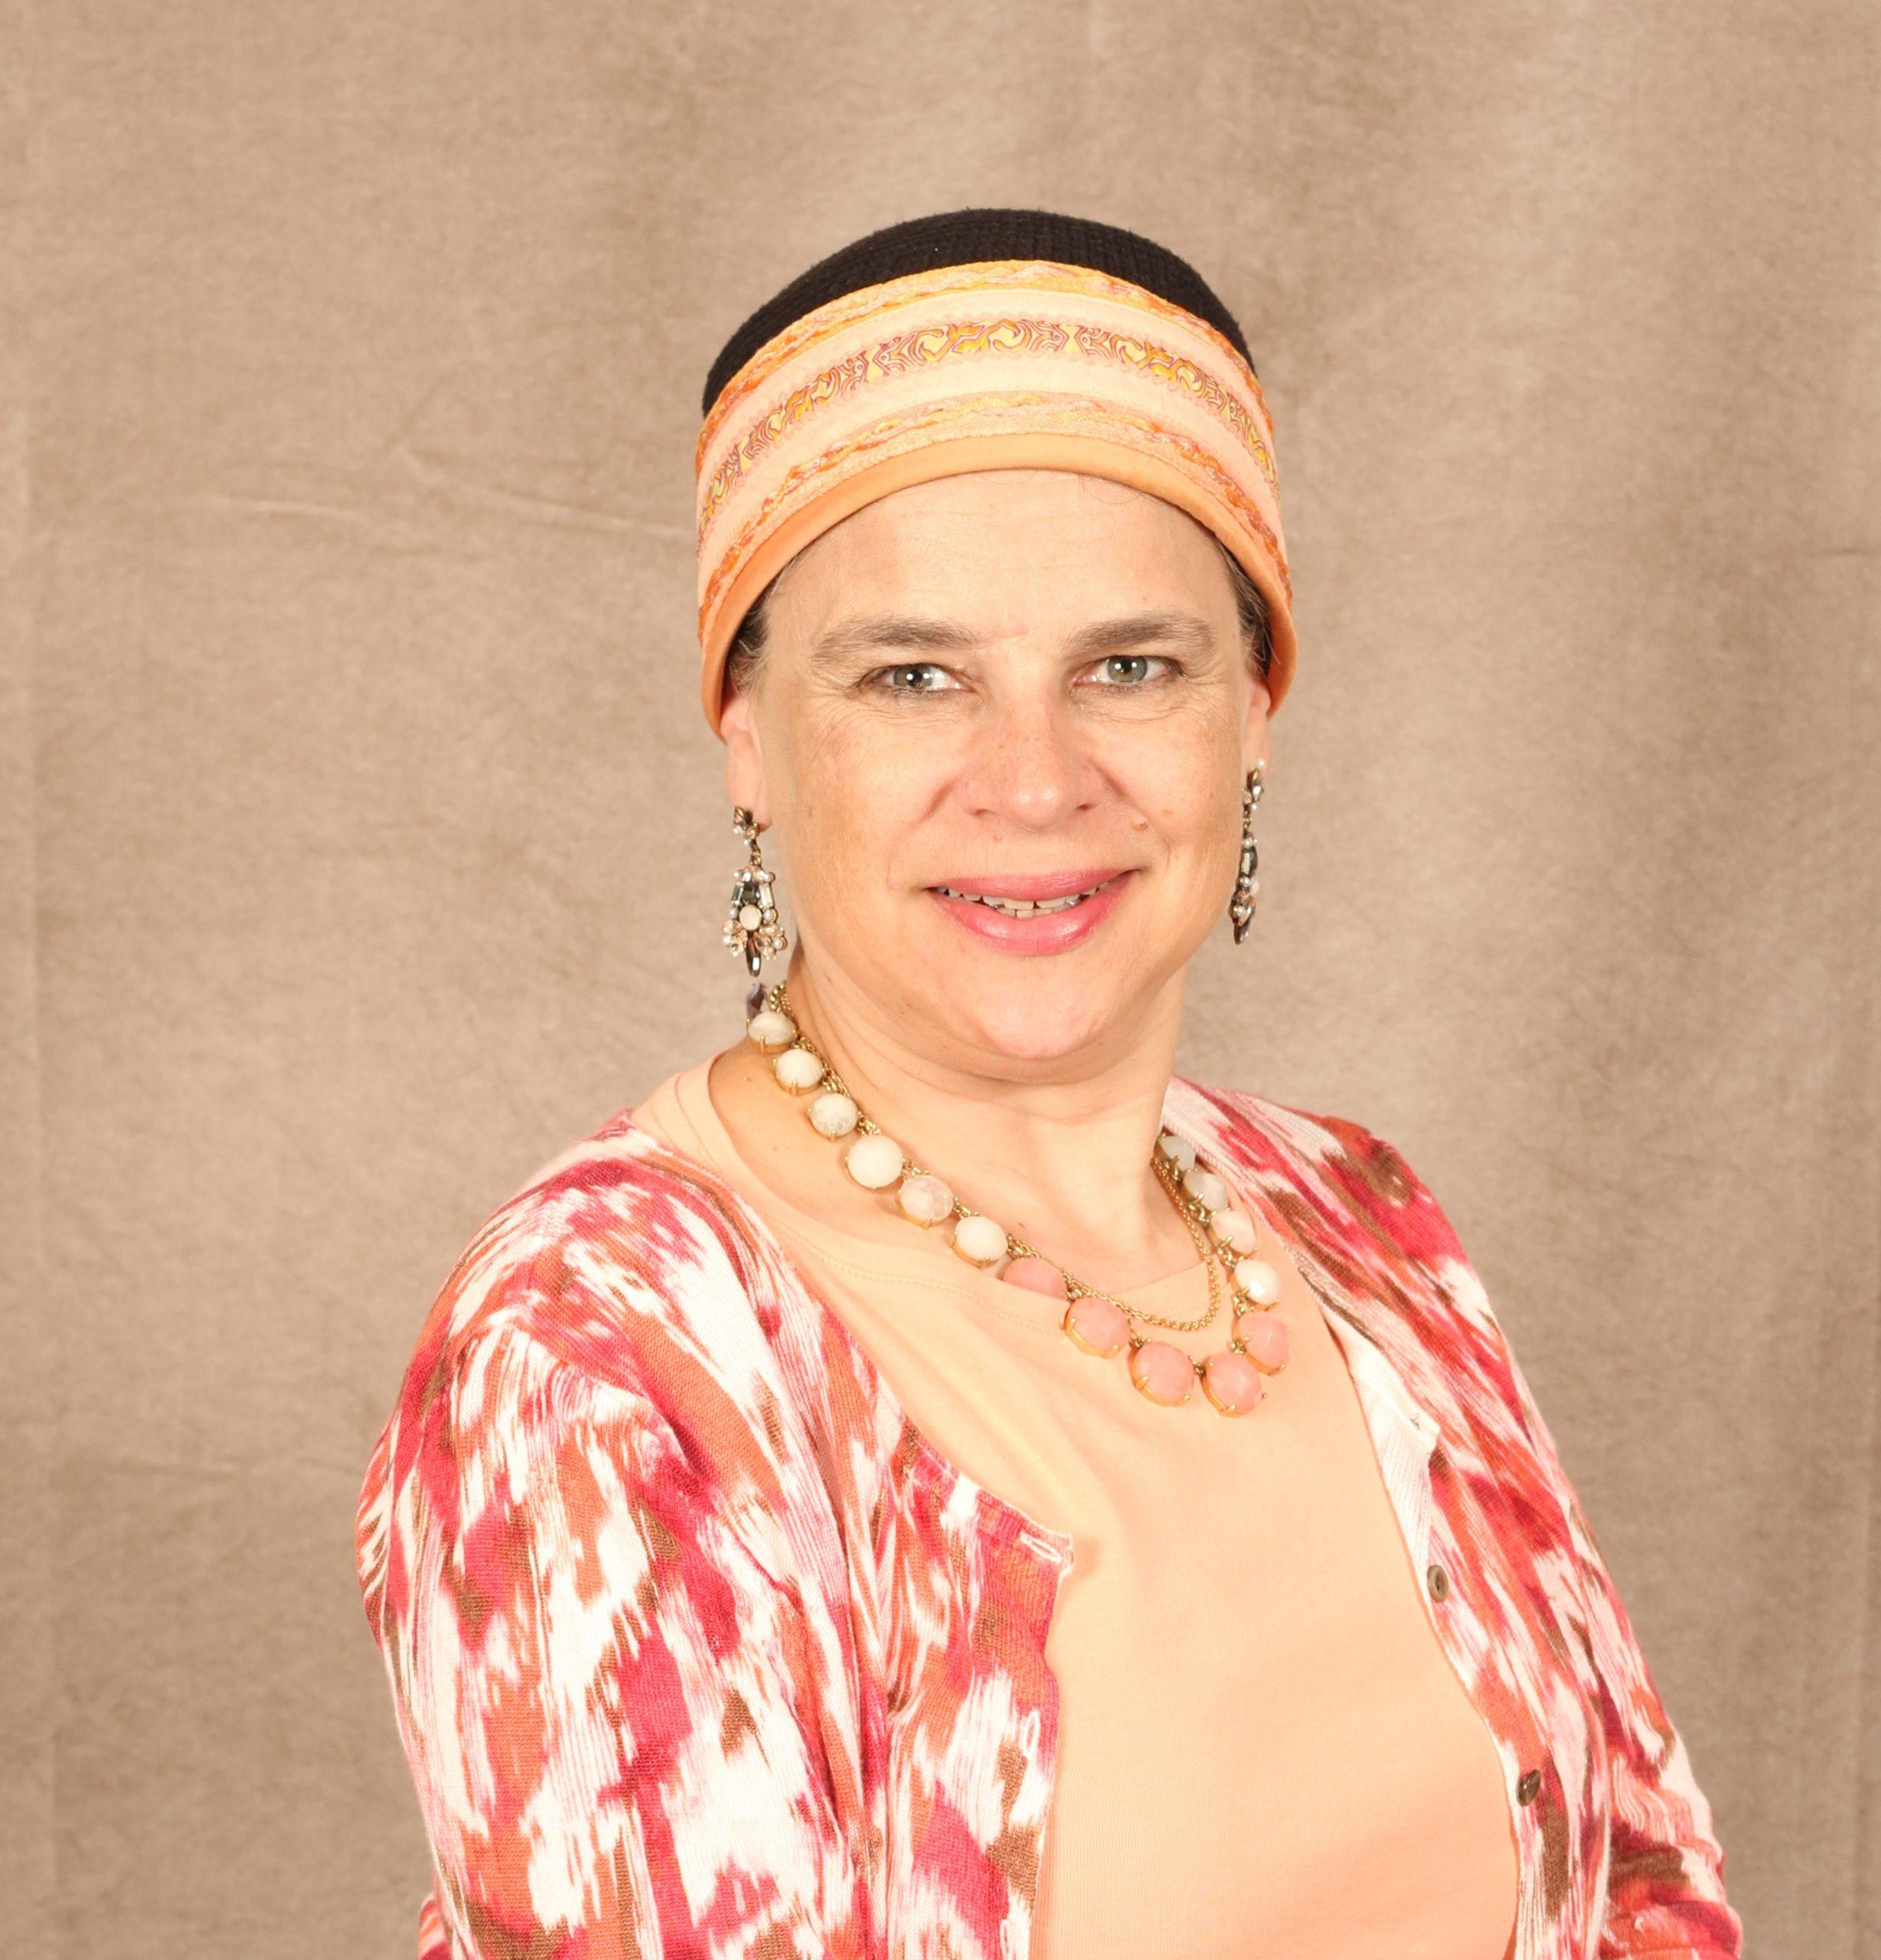 Rabbanit Leah Herzog